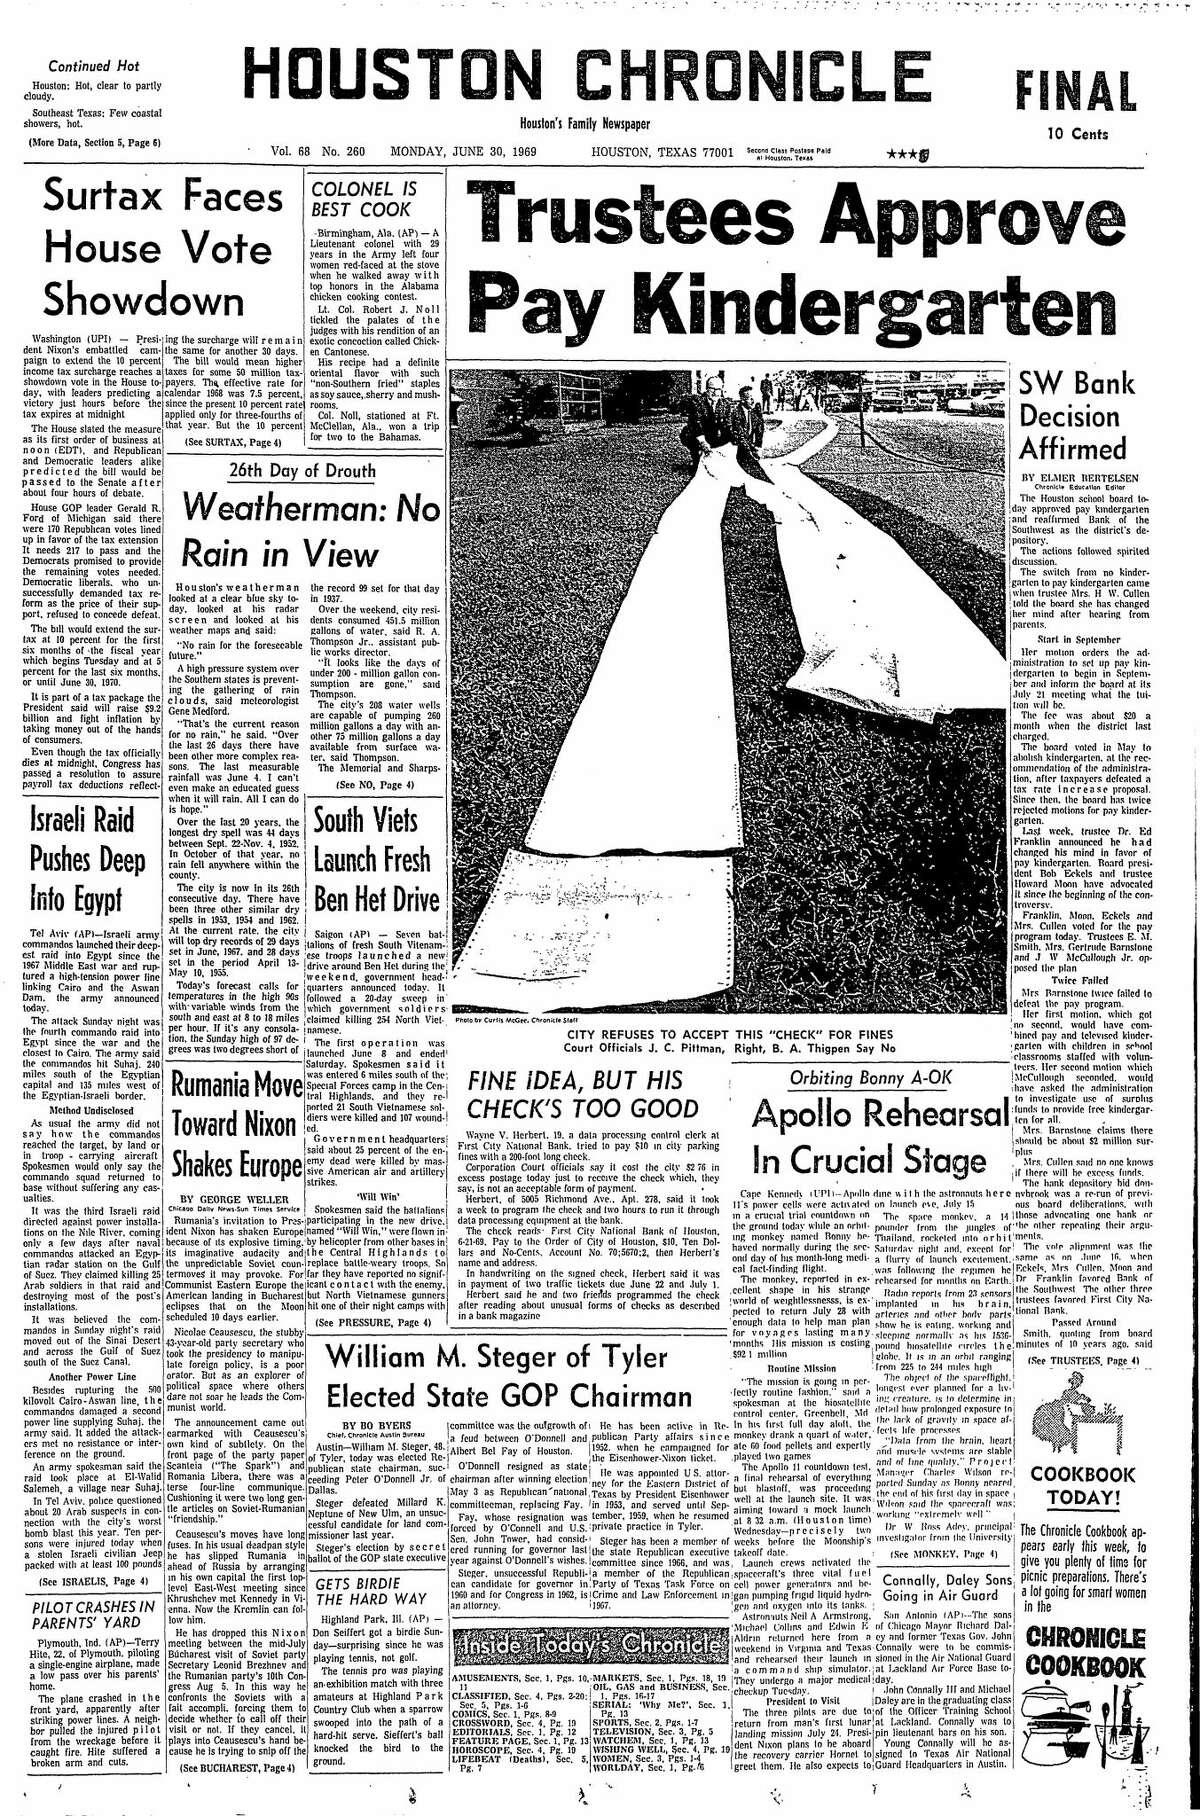 June 30, 1969